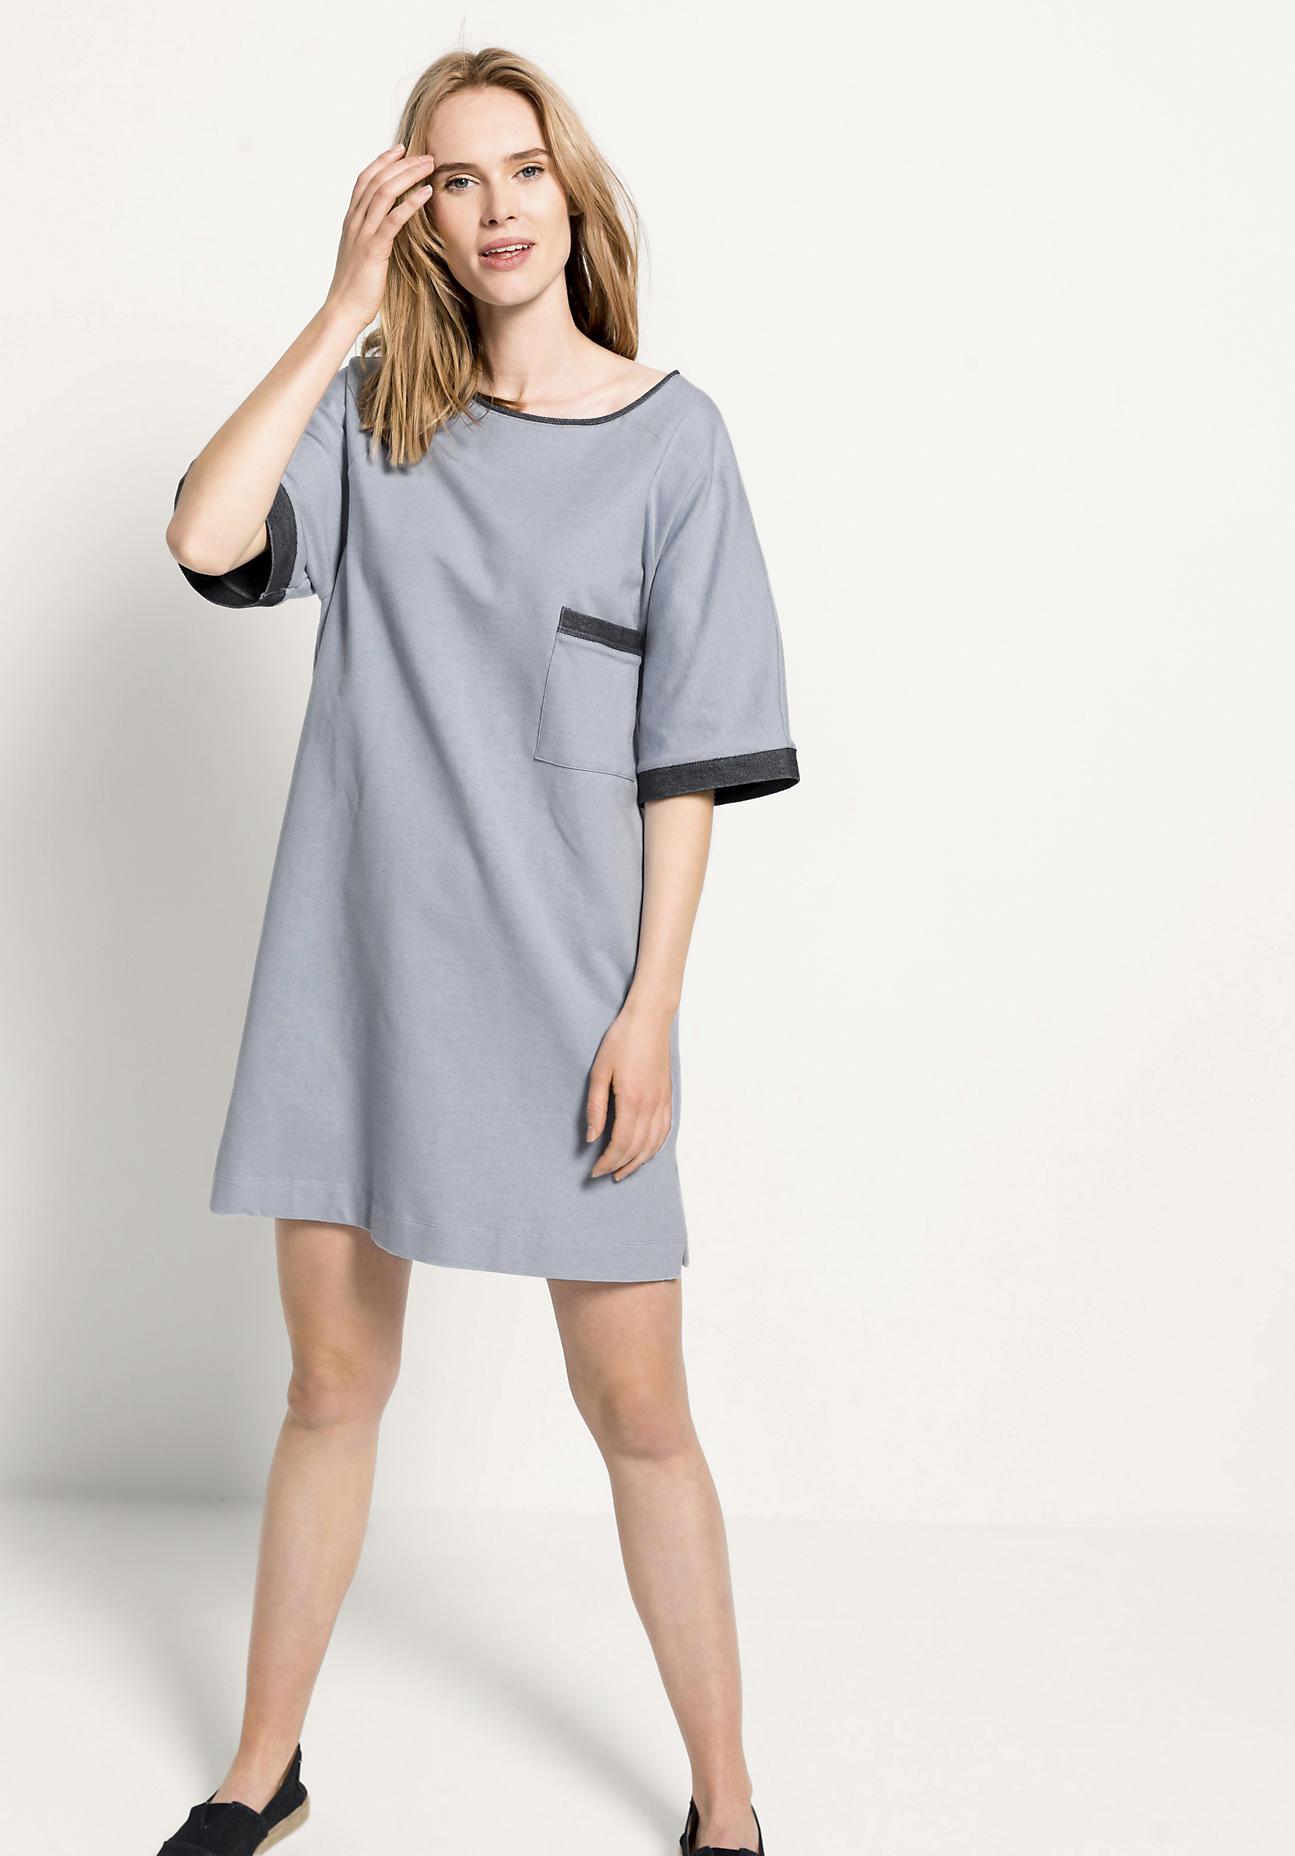 hessnatur Loungewear Sweatkleid aus Bio-Baumwolle - blau Größe 34